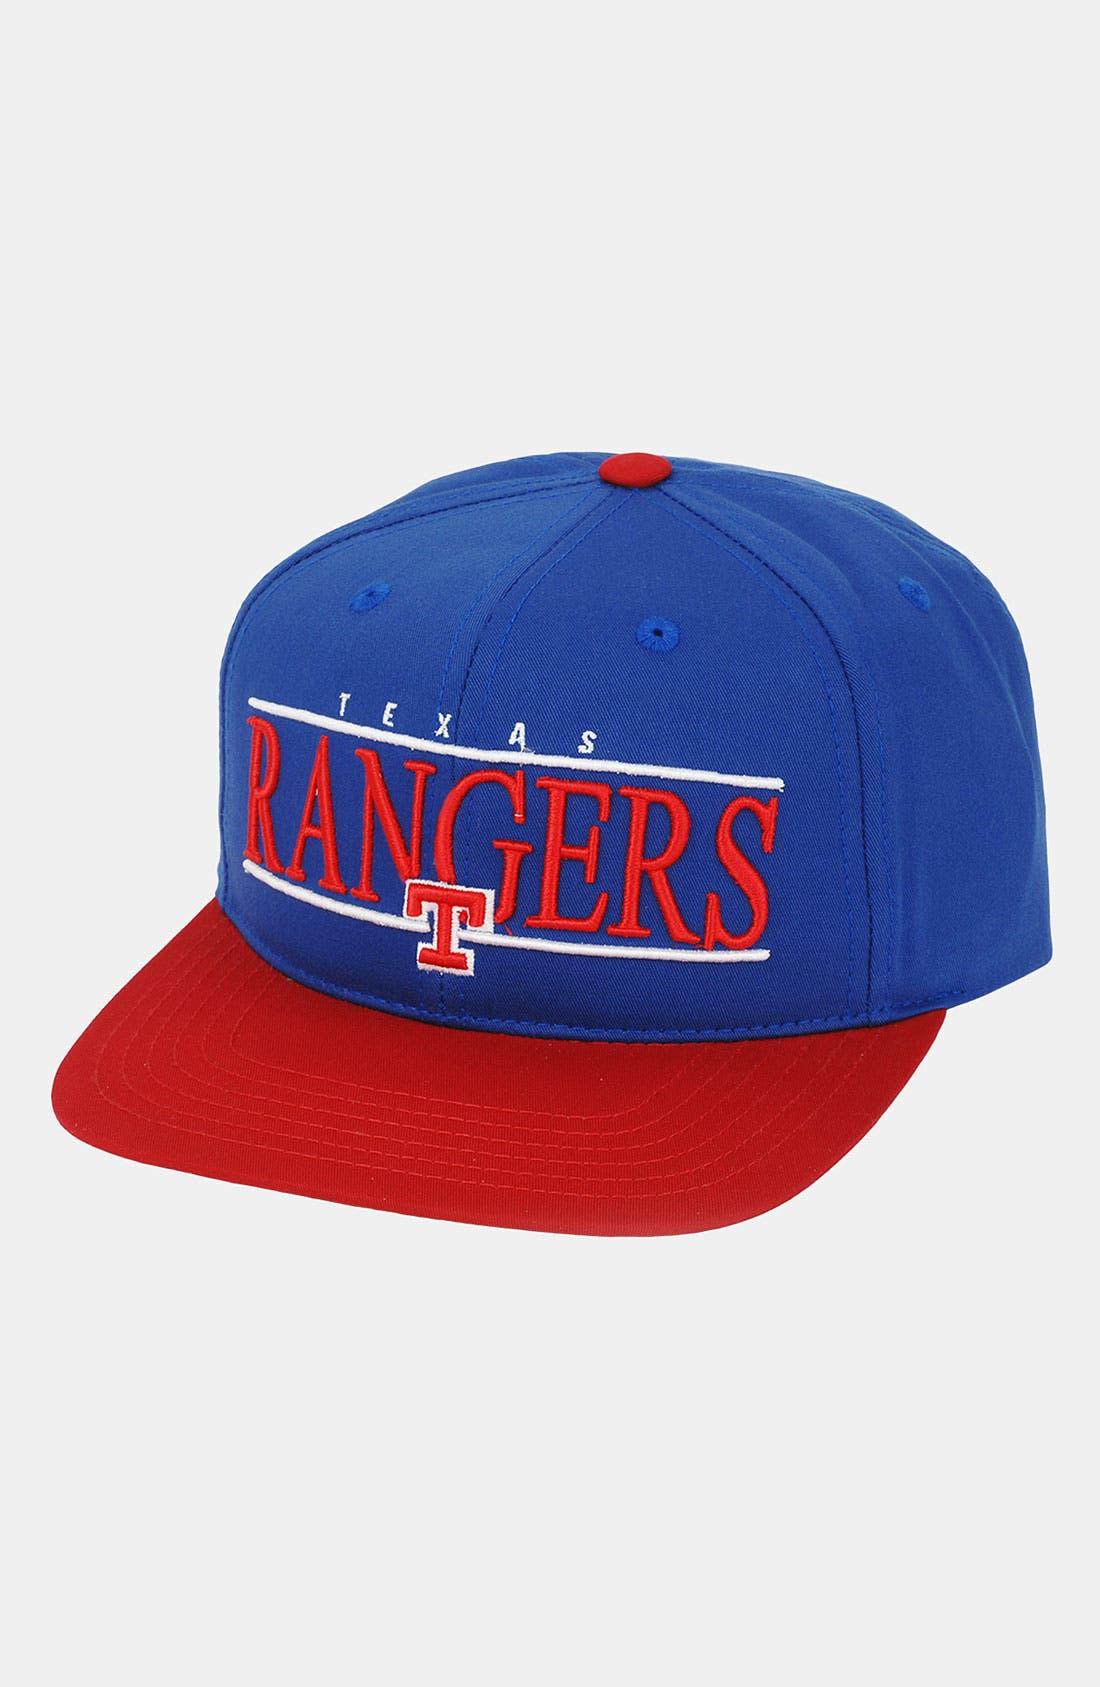 Main Image - American Needle 'Texas Rangers - Nineties' Twill Snapback Baseball Cap